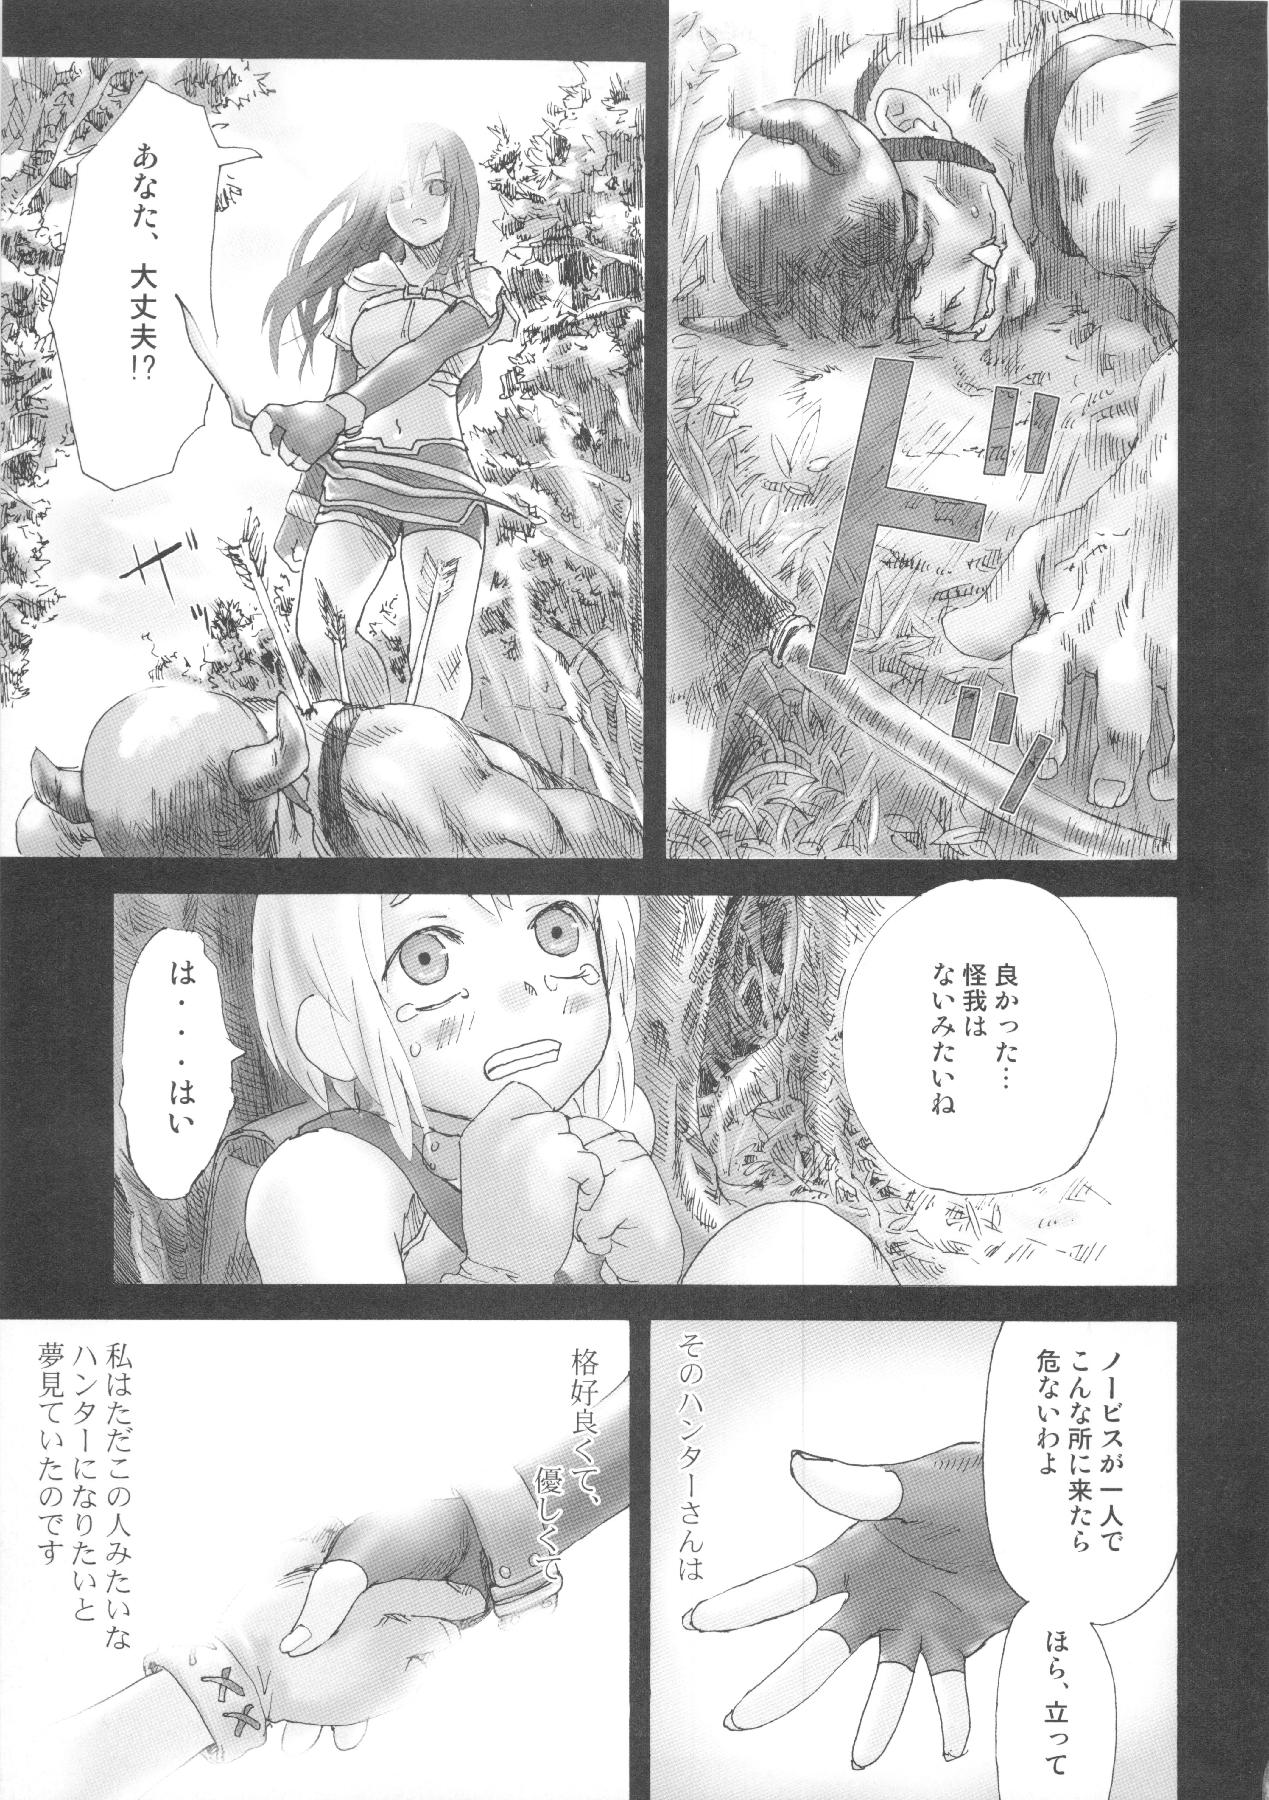 (C83) [Fatalpulse (Asanagi)] VictimGirls Compiled Vol.1 -Victimgirls Soushuuhen 1- MMO Game Selection (Various) 53